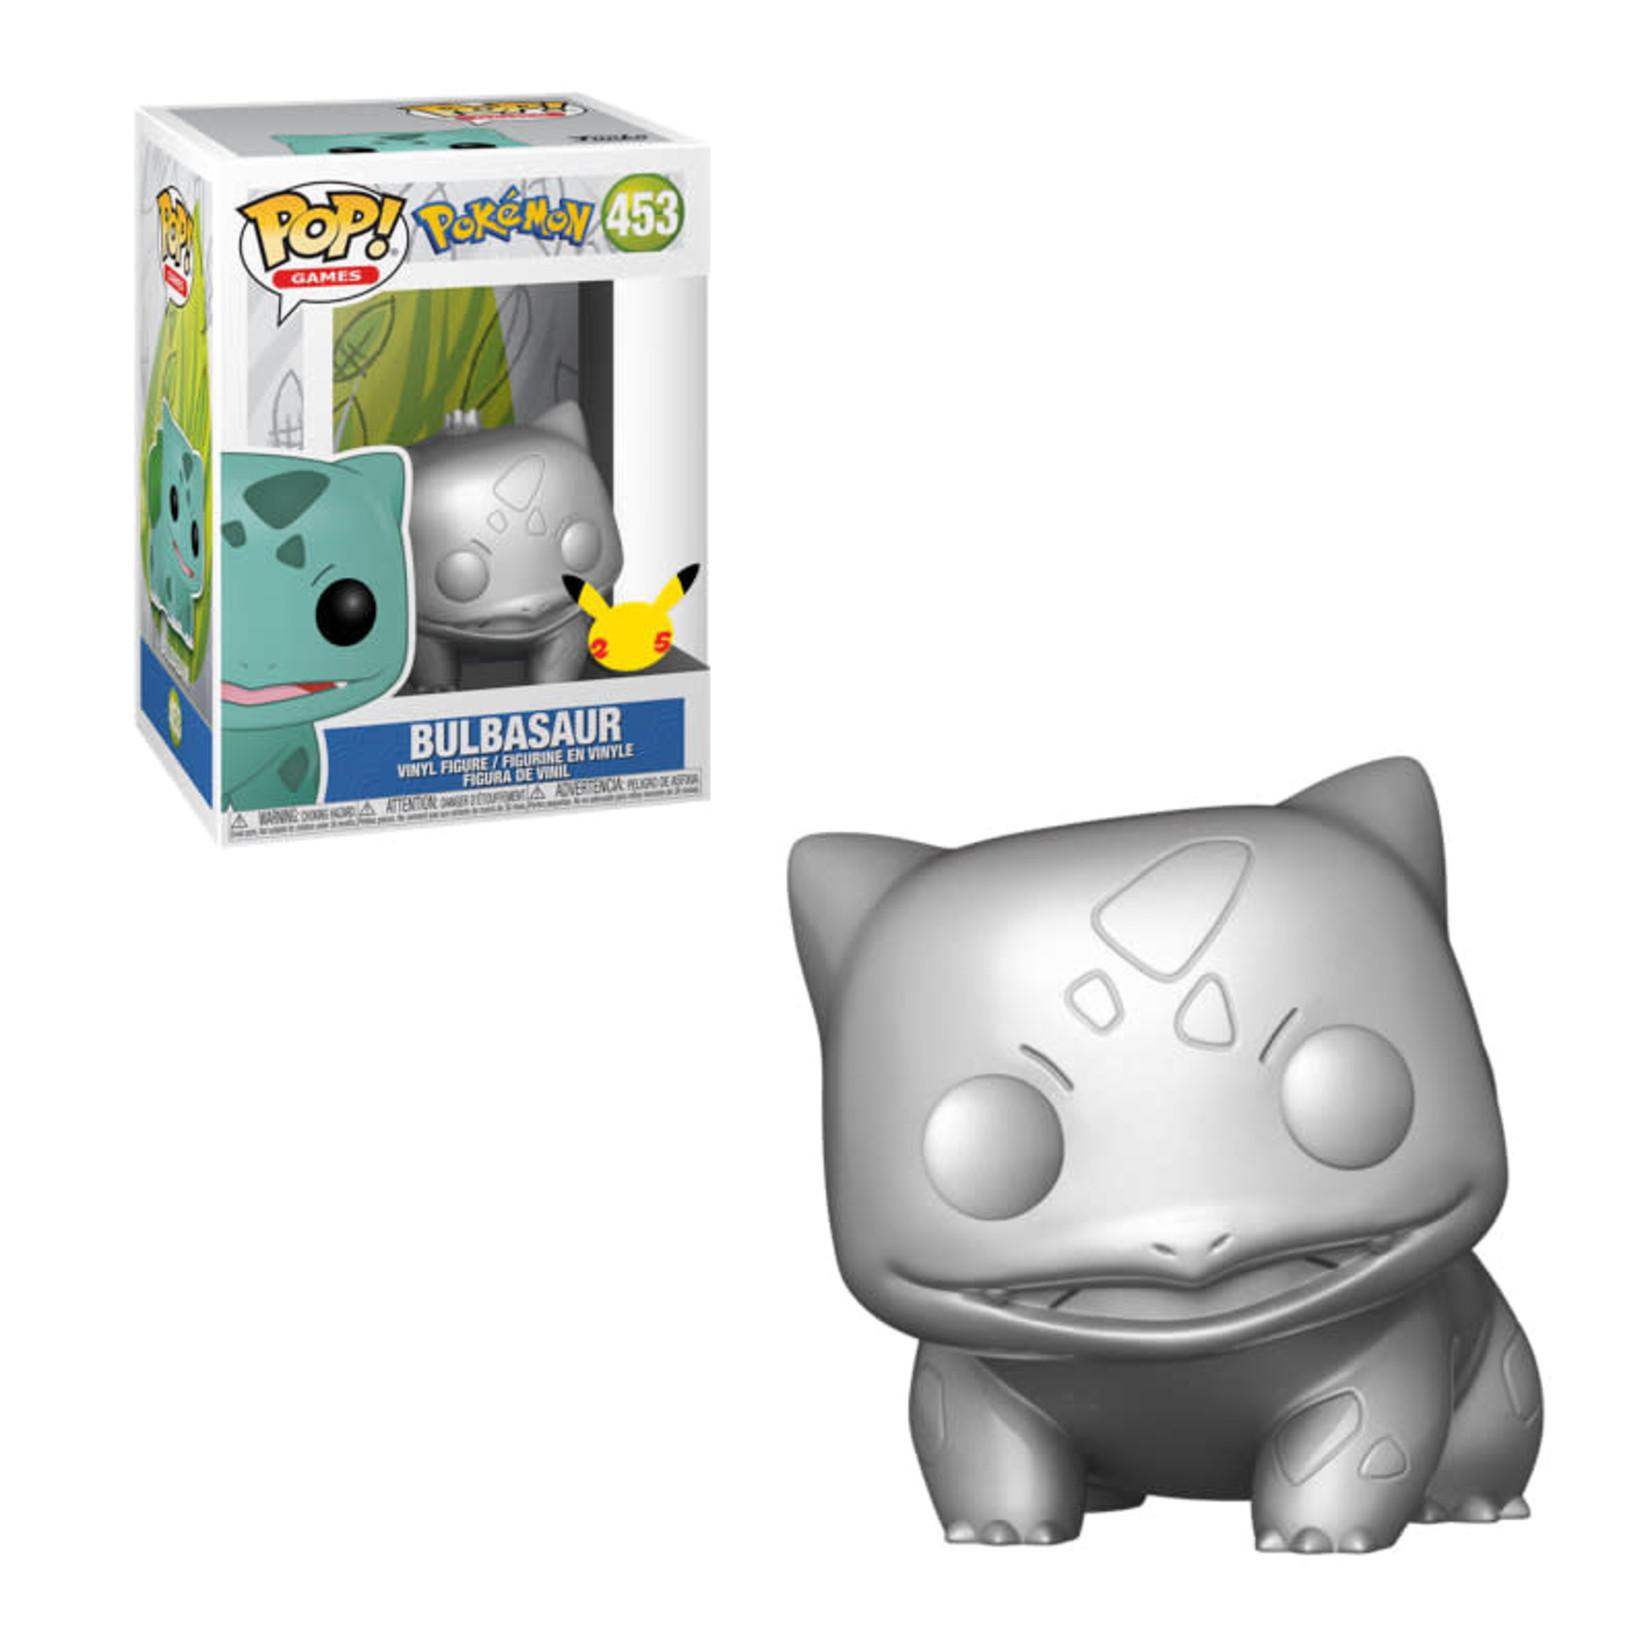 Funko Pop! Games: Pokemon  - Bulbasaur #453